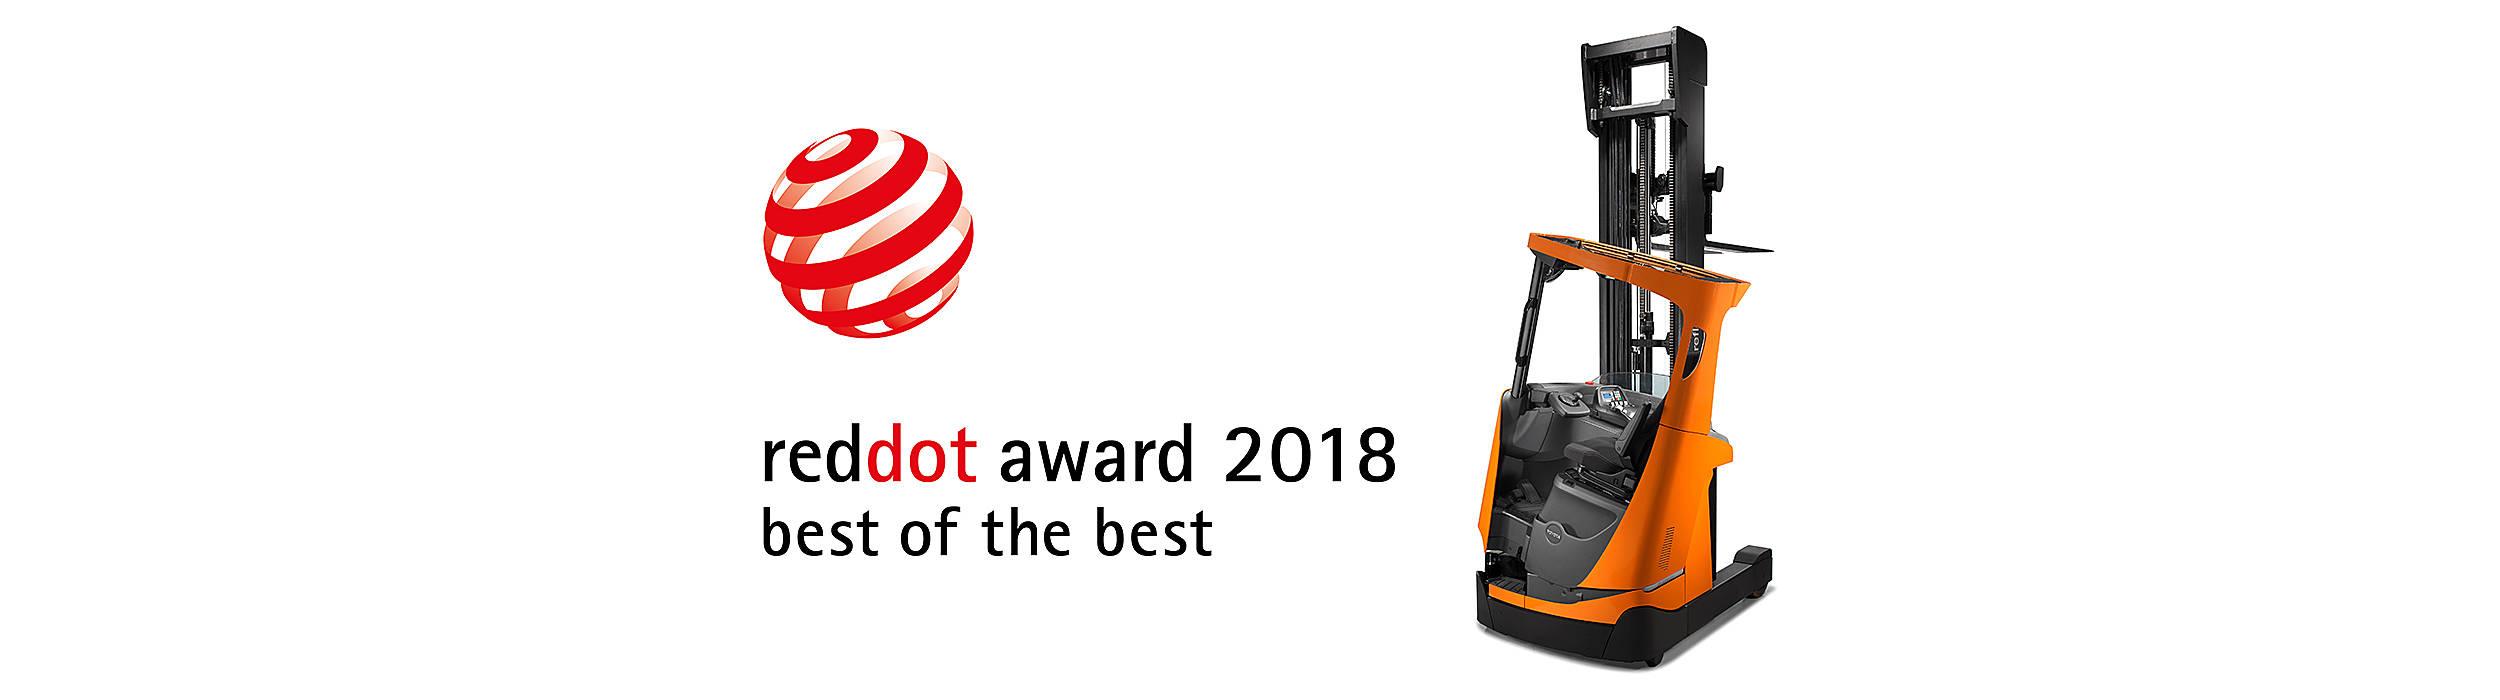 La Retr 225 Ctil Bt Reflex Serie E De Toyota Recibe El Red Dot Best Of The Best